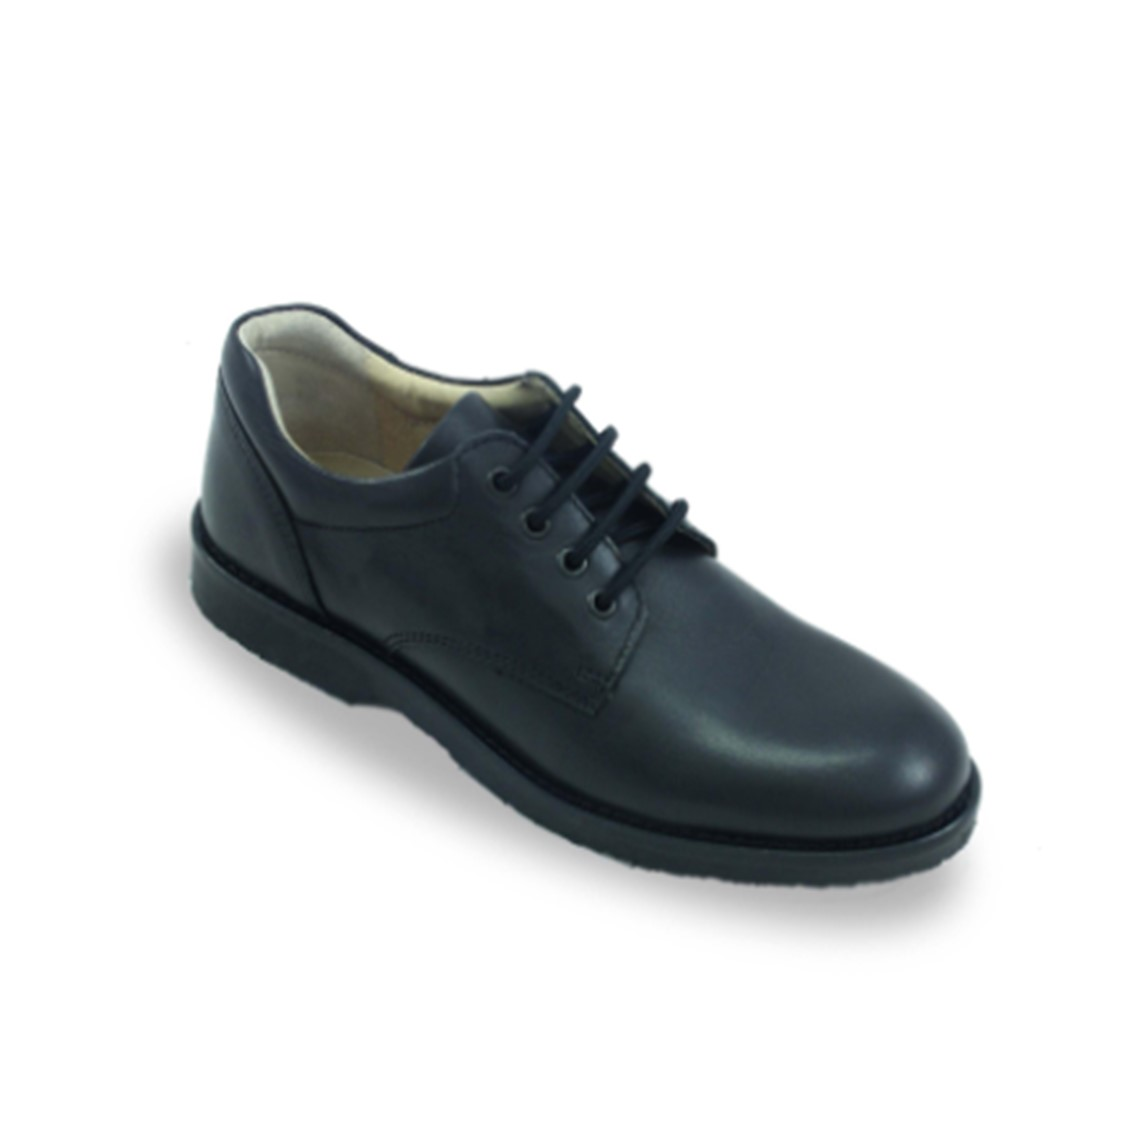 School Shoes PETASIL Marcus Laced 5769